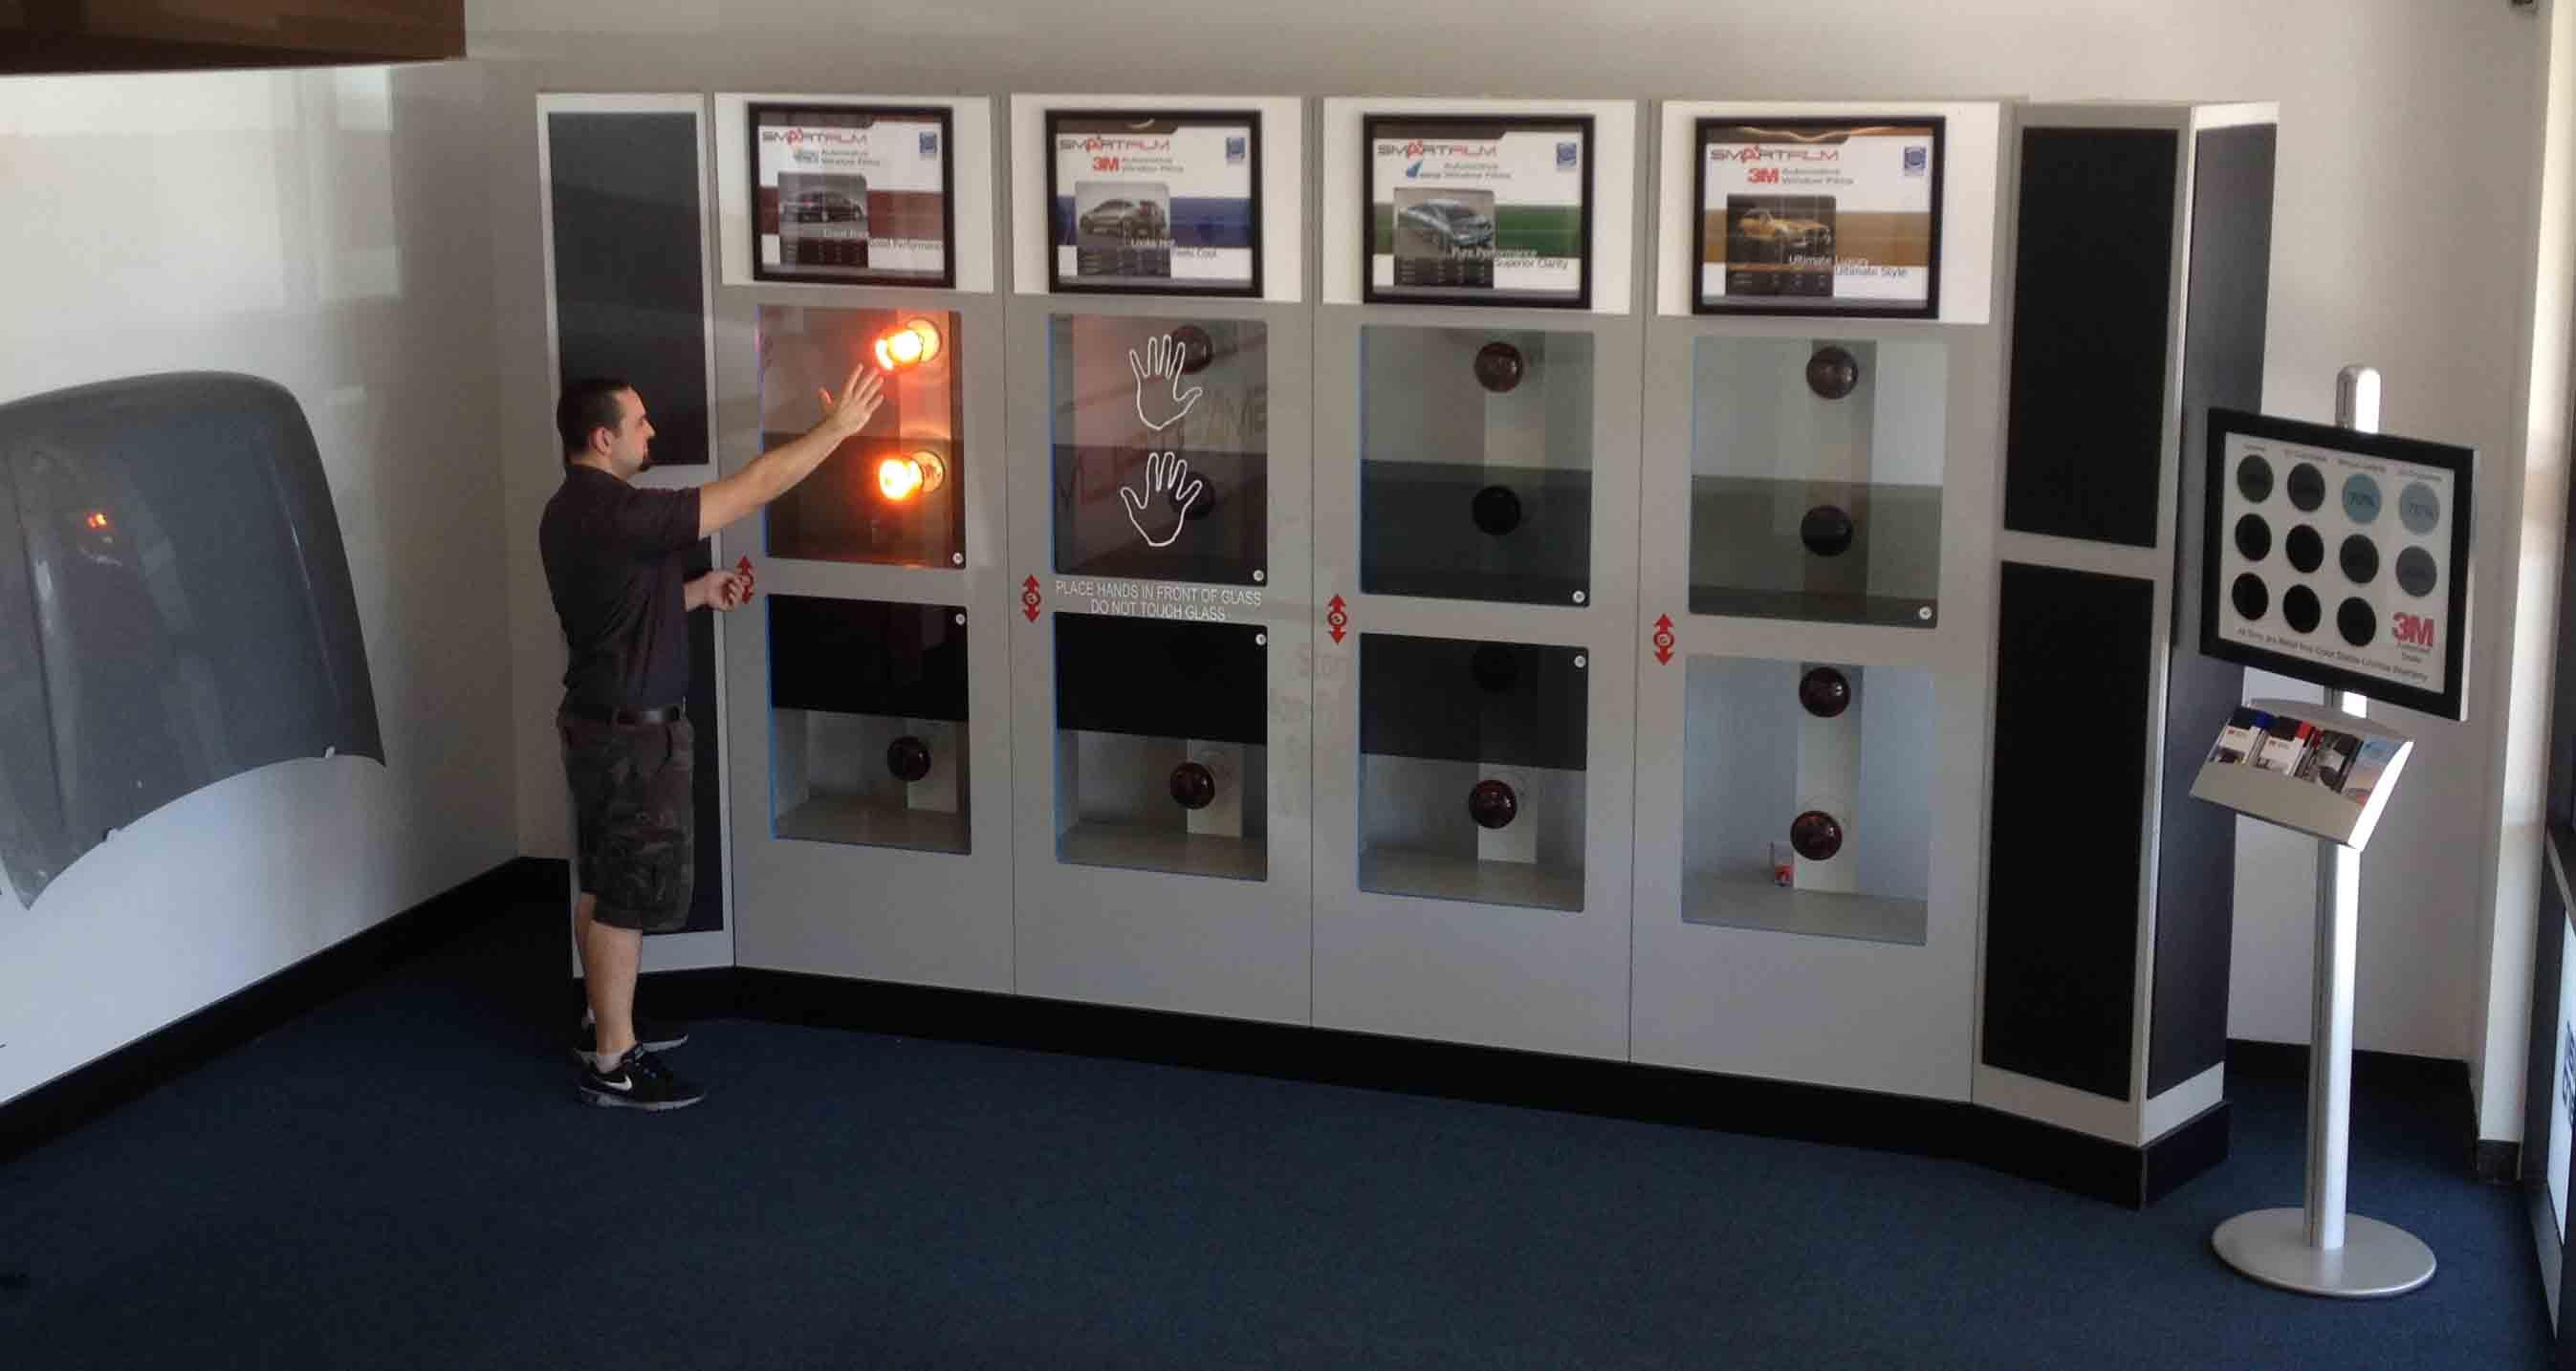 3M Tint Heat Wall Display Mesa, AZ